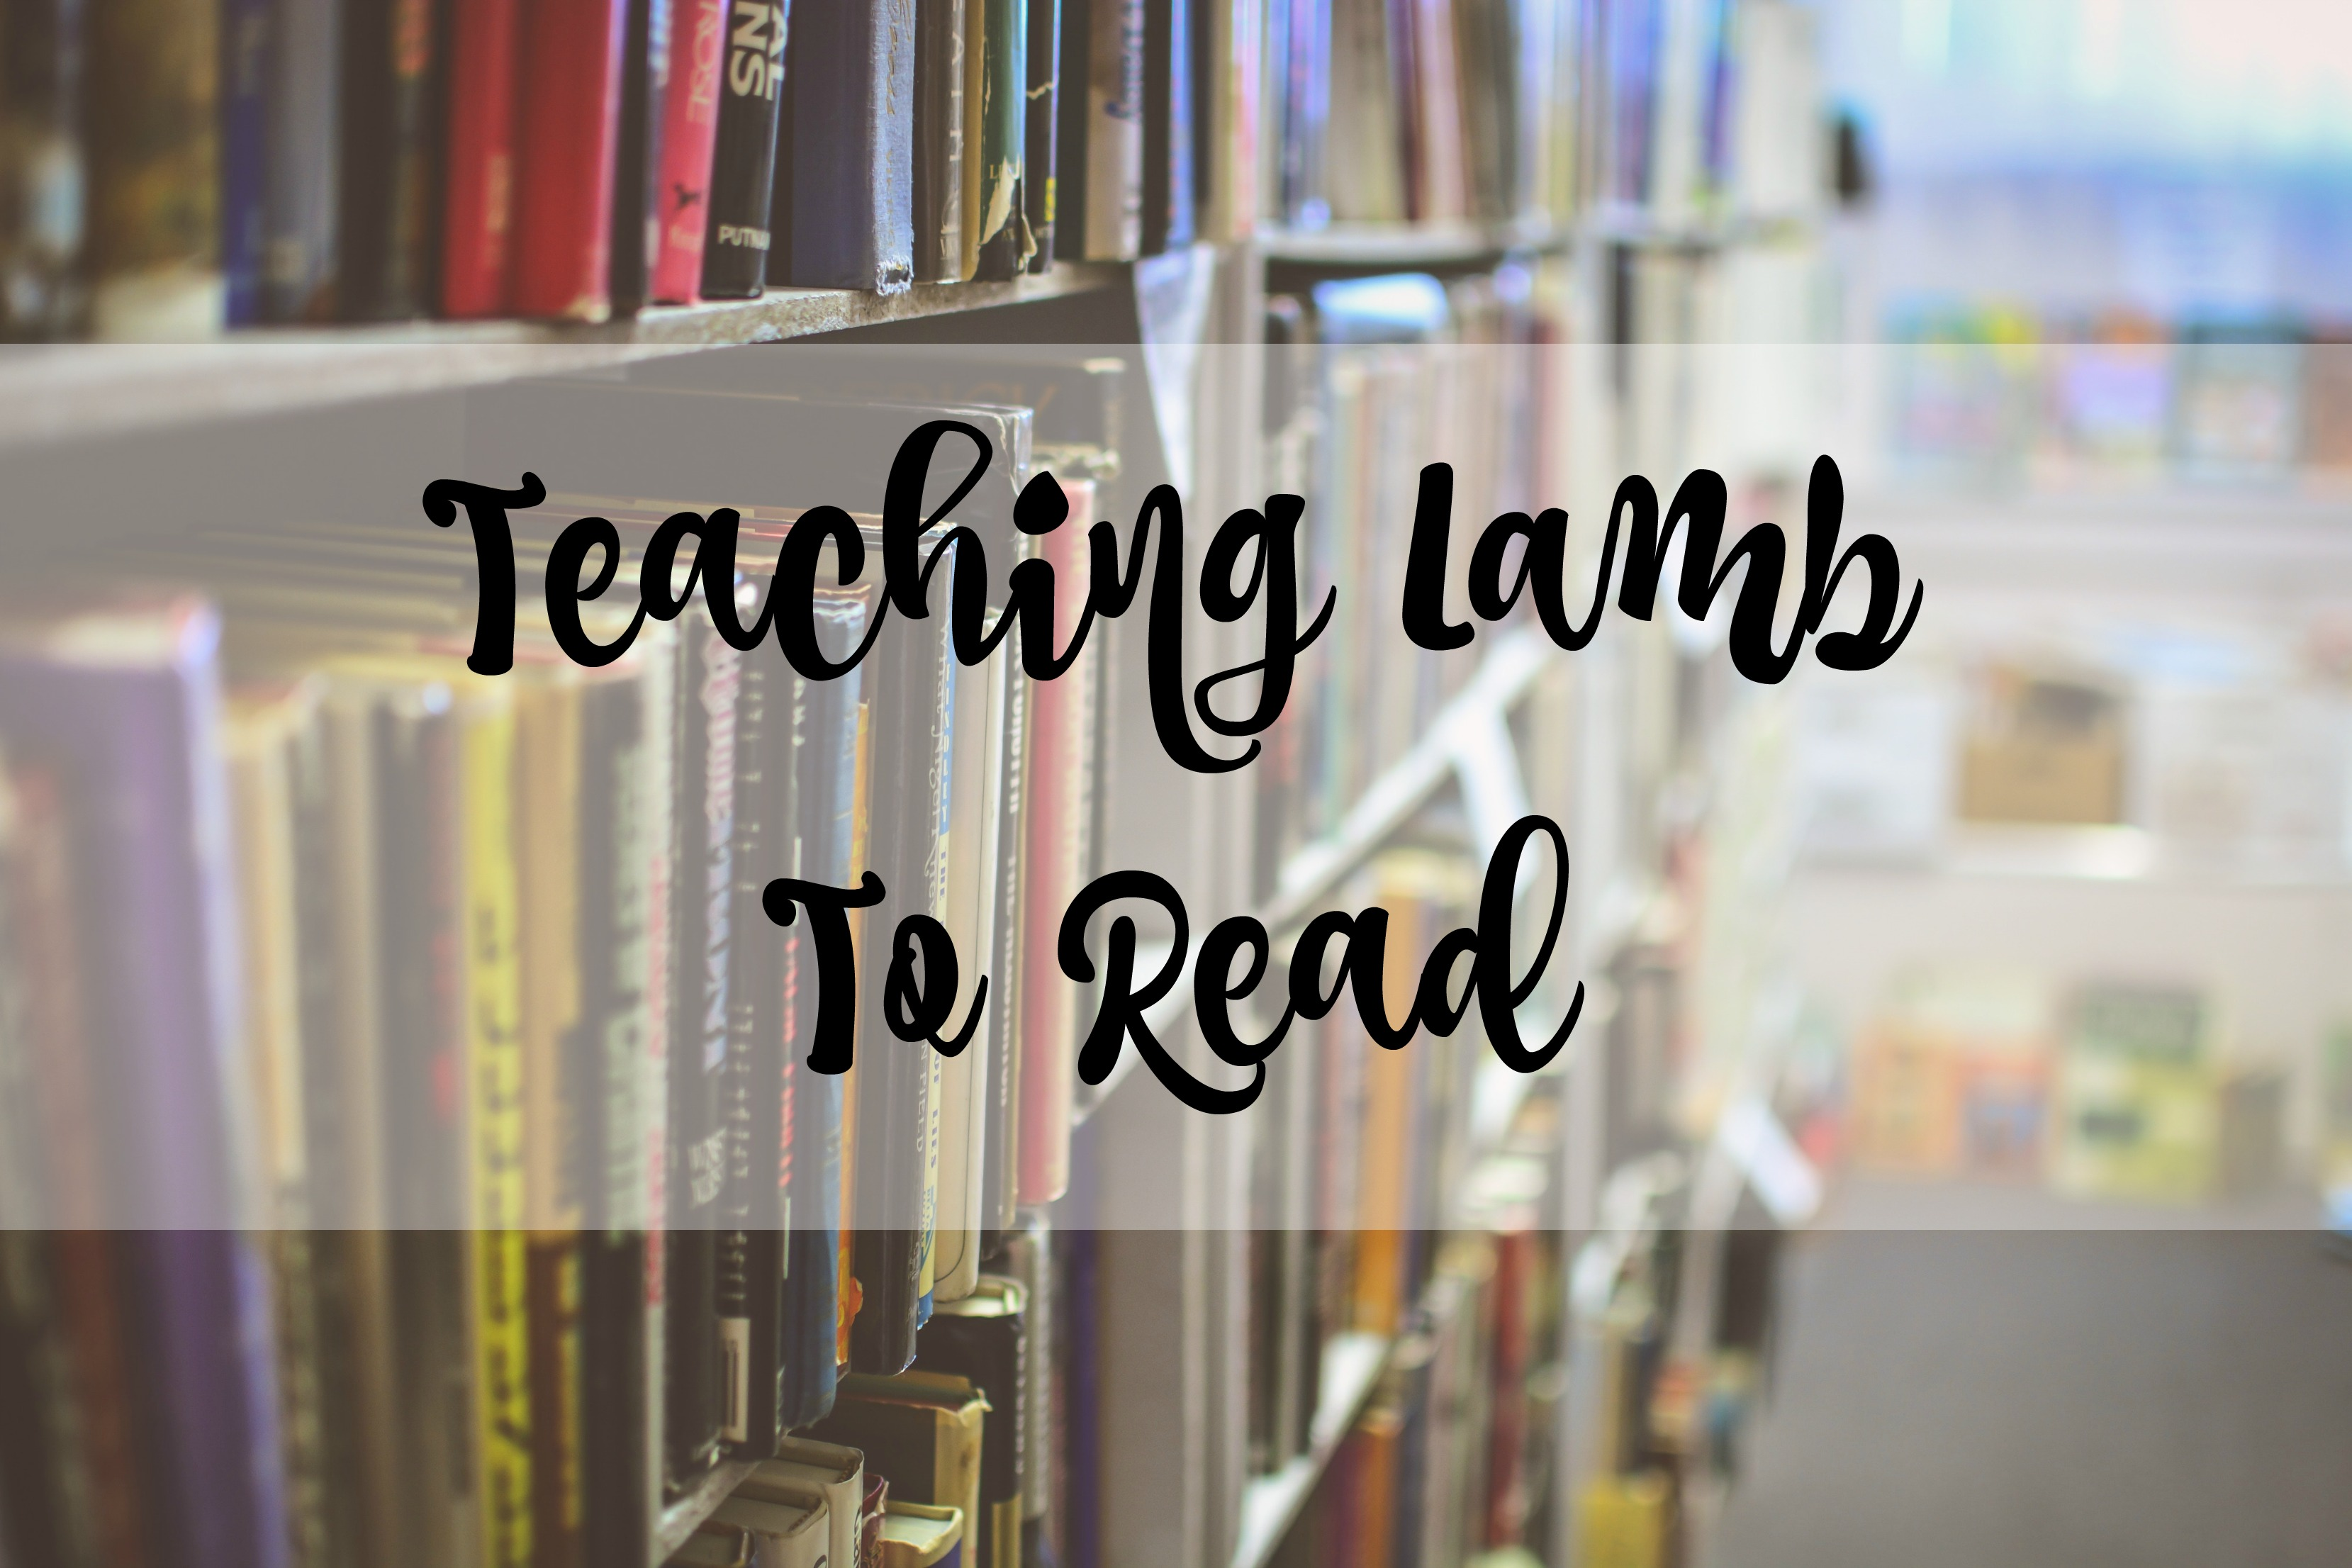 teaching lamb to read title